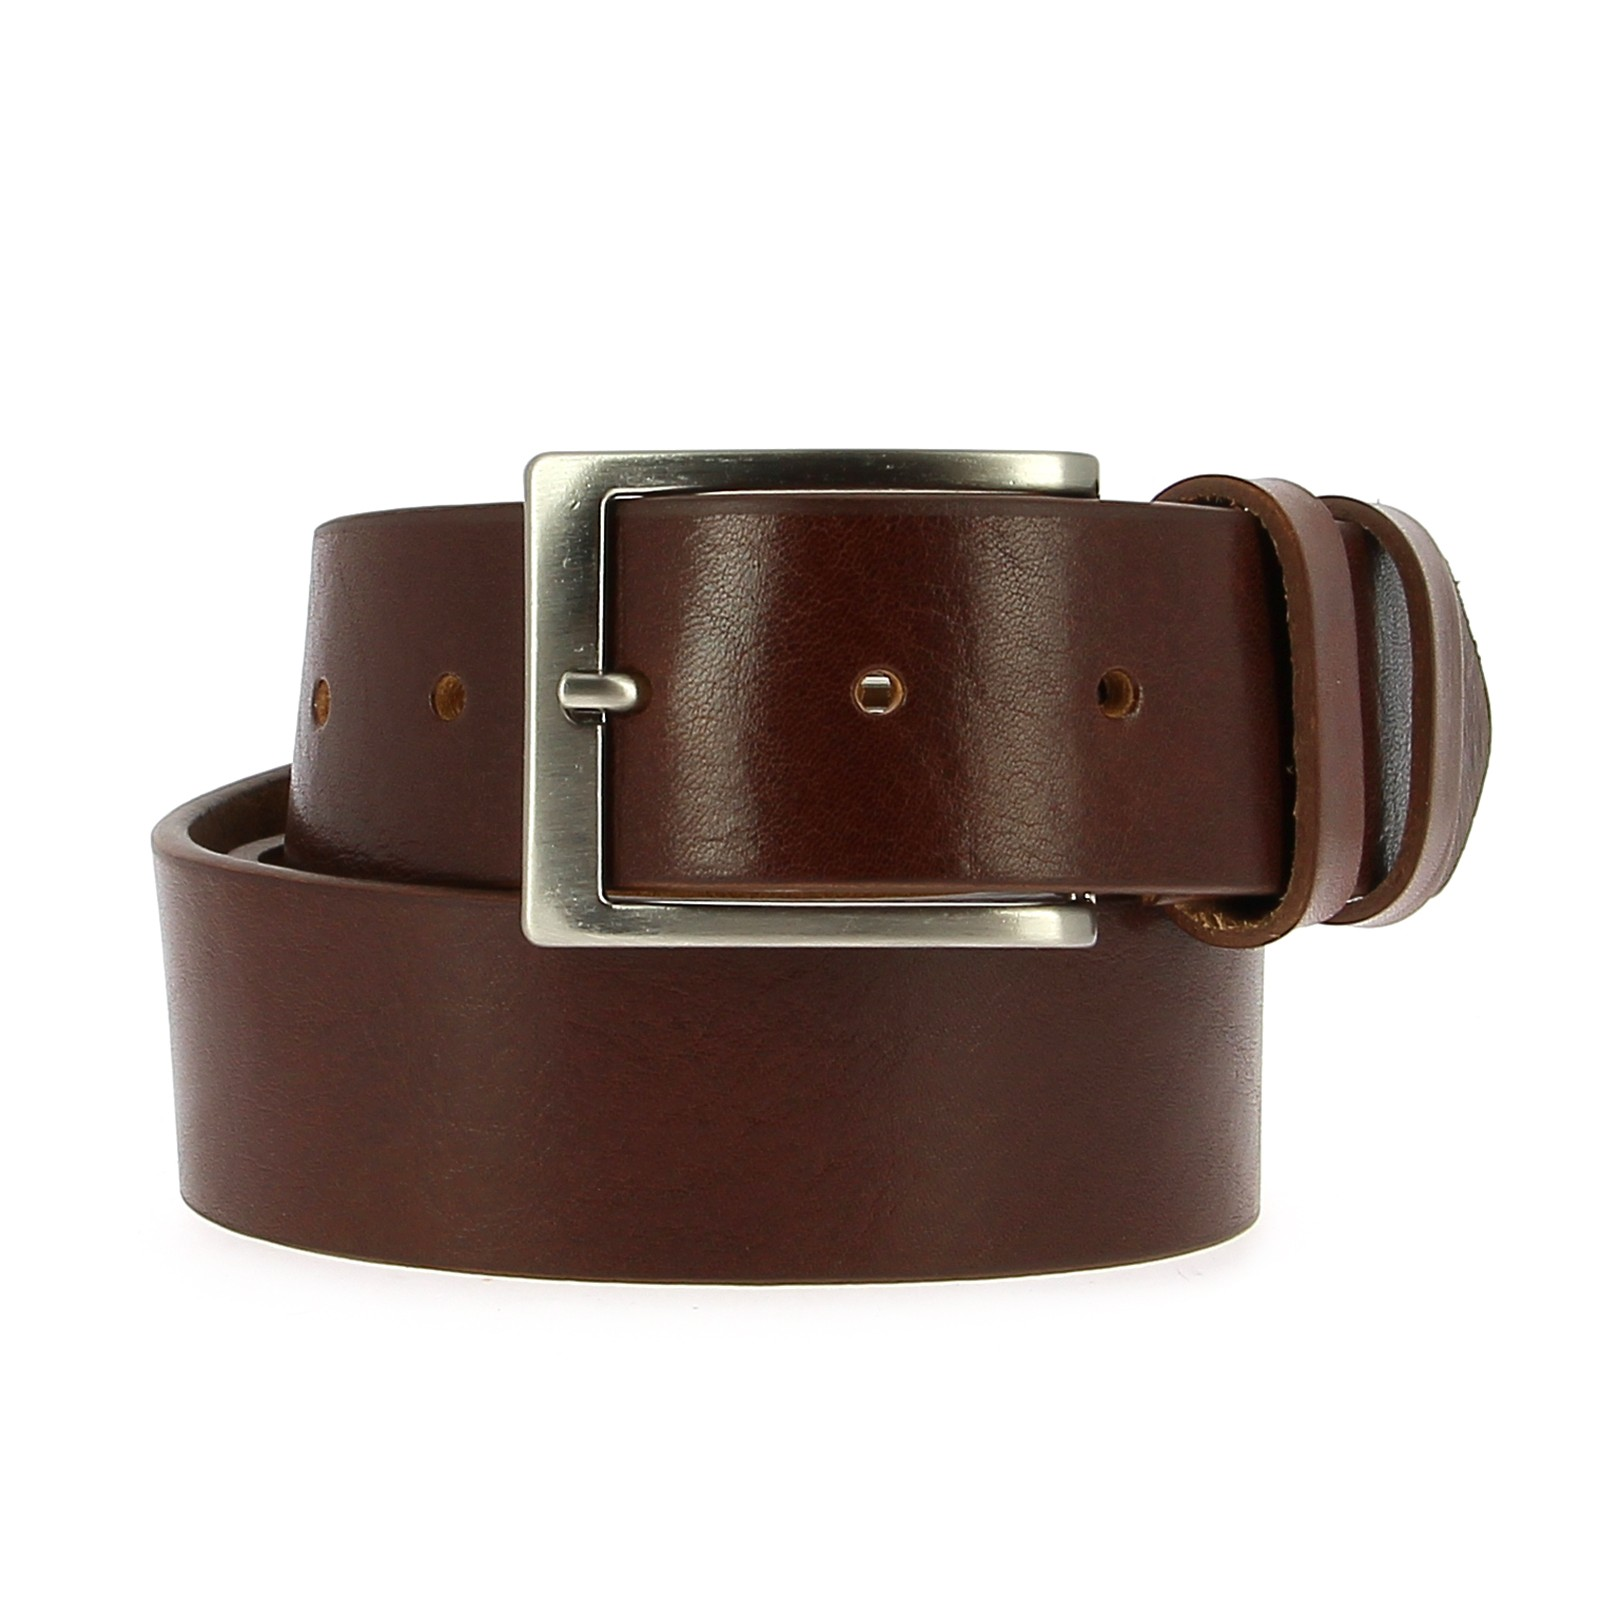 Belts Leather 40mm 130cm Jean Rich Brown